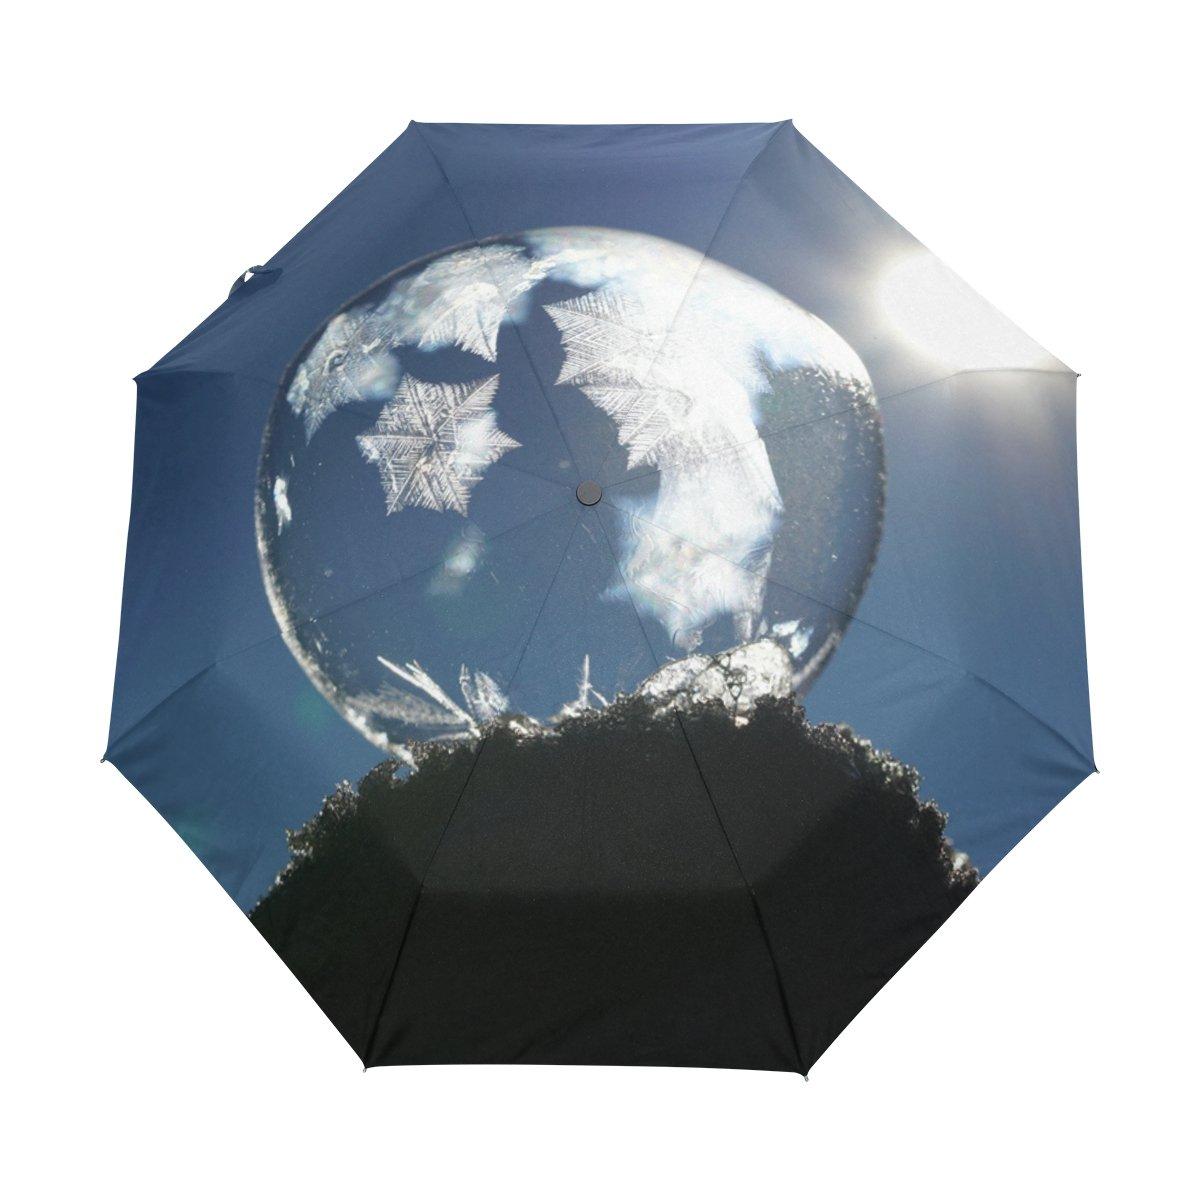 foldable Umbrella Custom Yellow Rose Compact Travel Windproof Rainproof